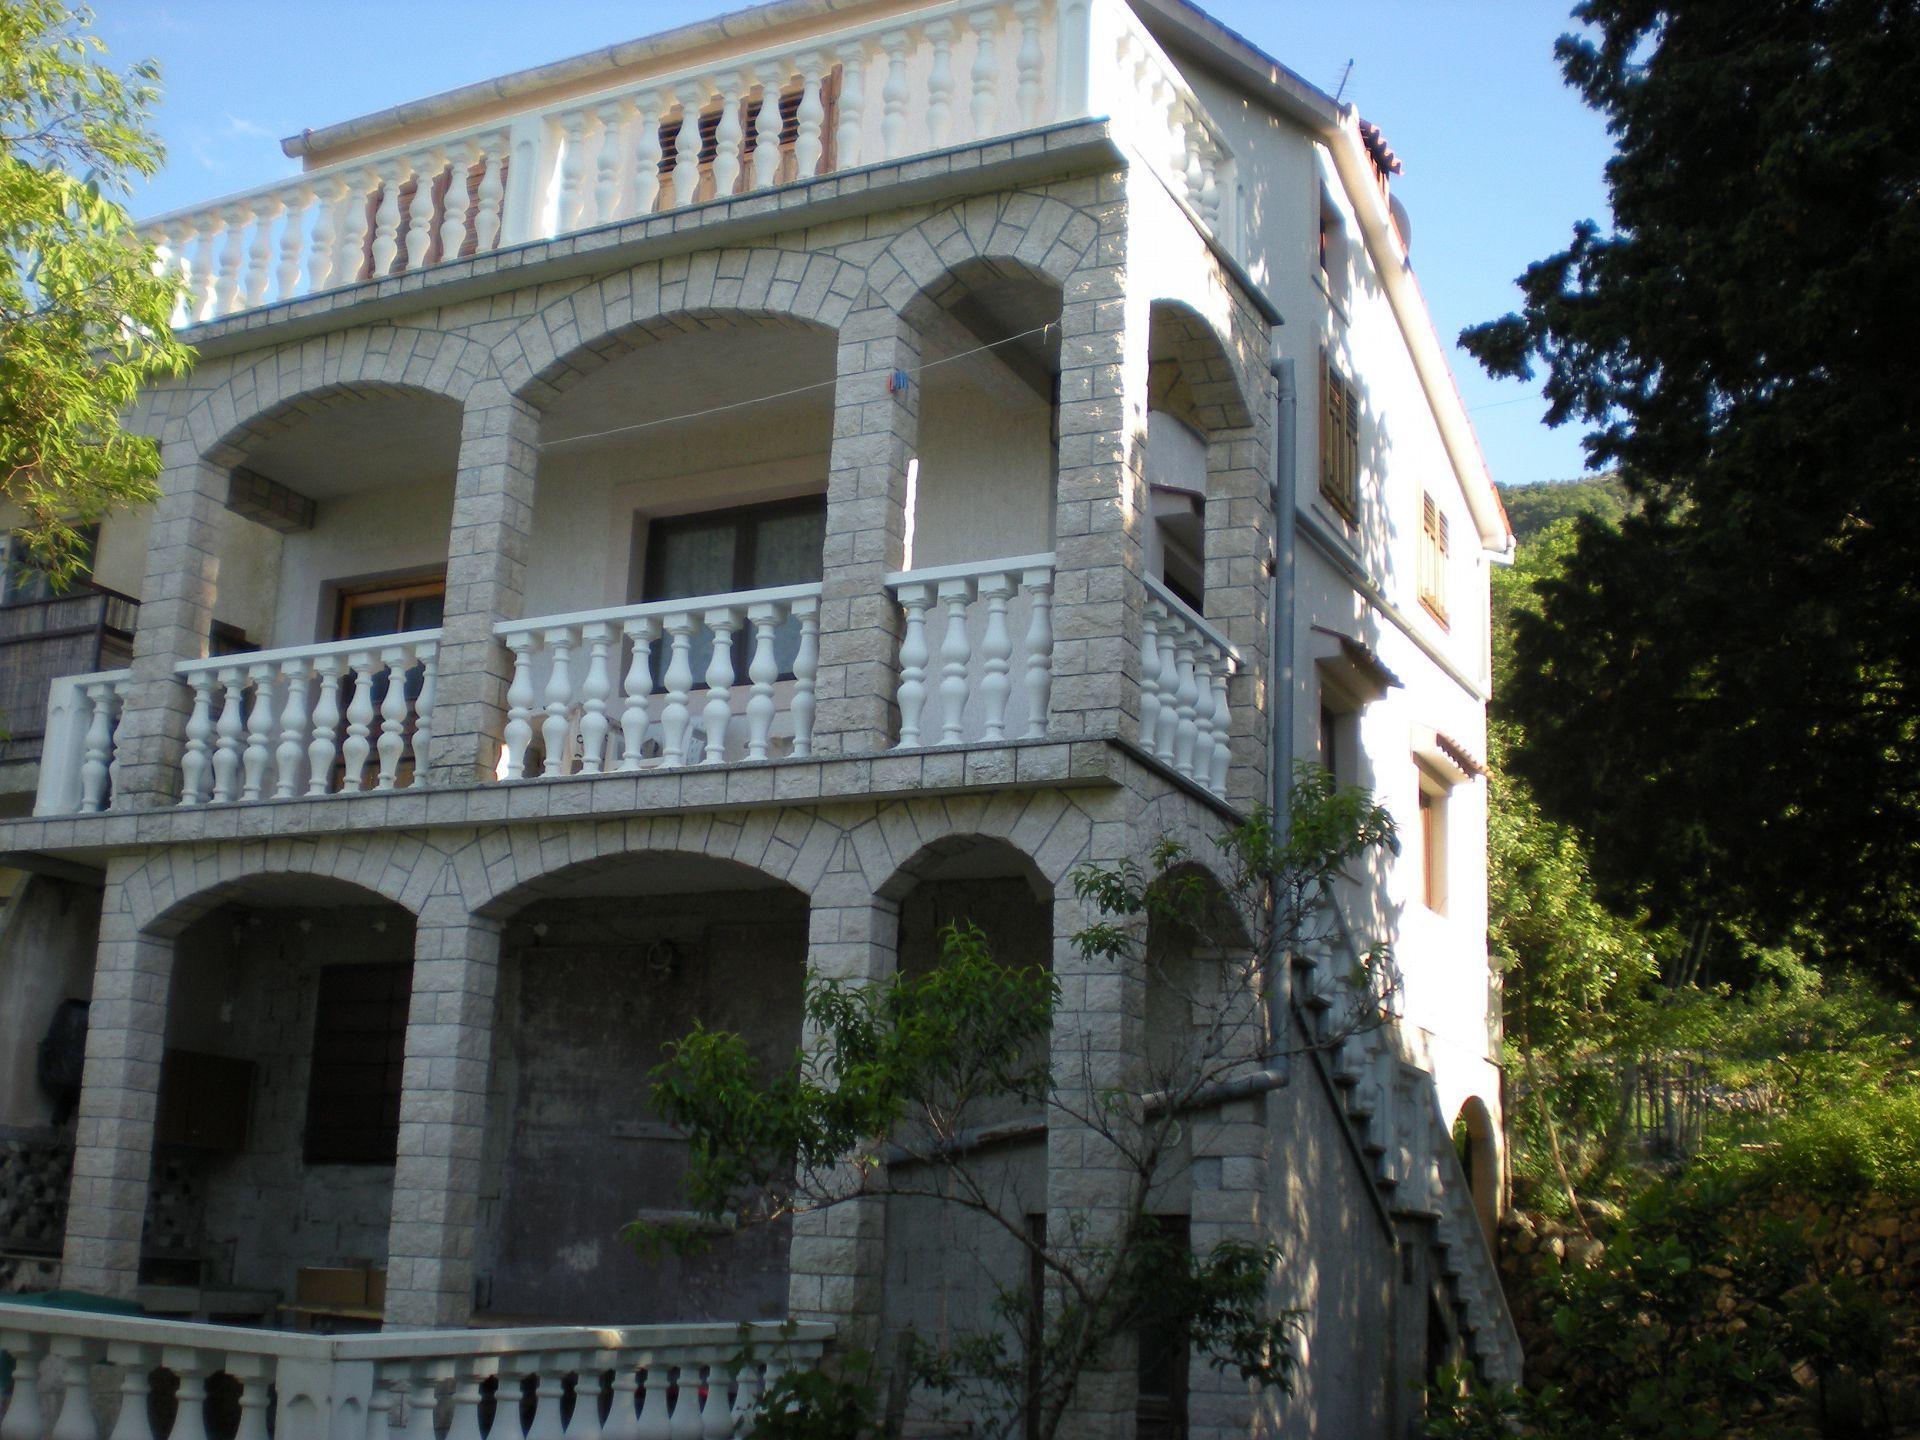 Appartement de vacances BT A2(4) - Merag (769321), Merag, Île de Cres, Kvarner, Croatie, image 2